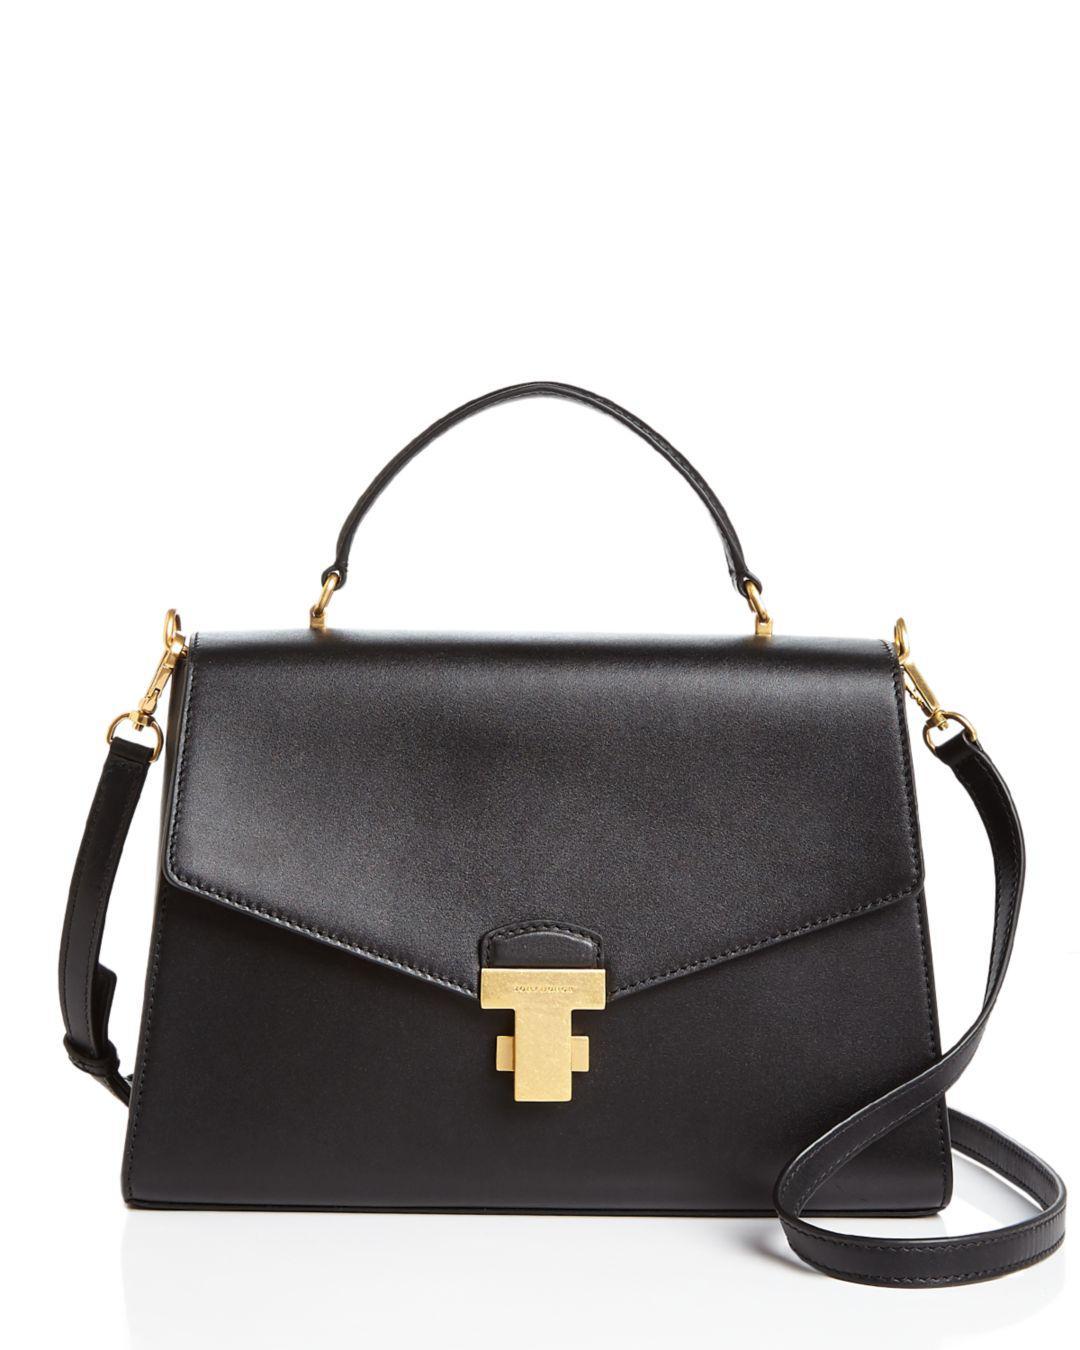 a7b4bae7431f Tory Burch. Women s Black Juliette Large Leather Satchel.  558 From  Bloomingdale s